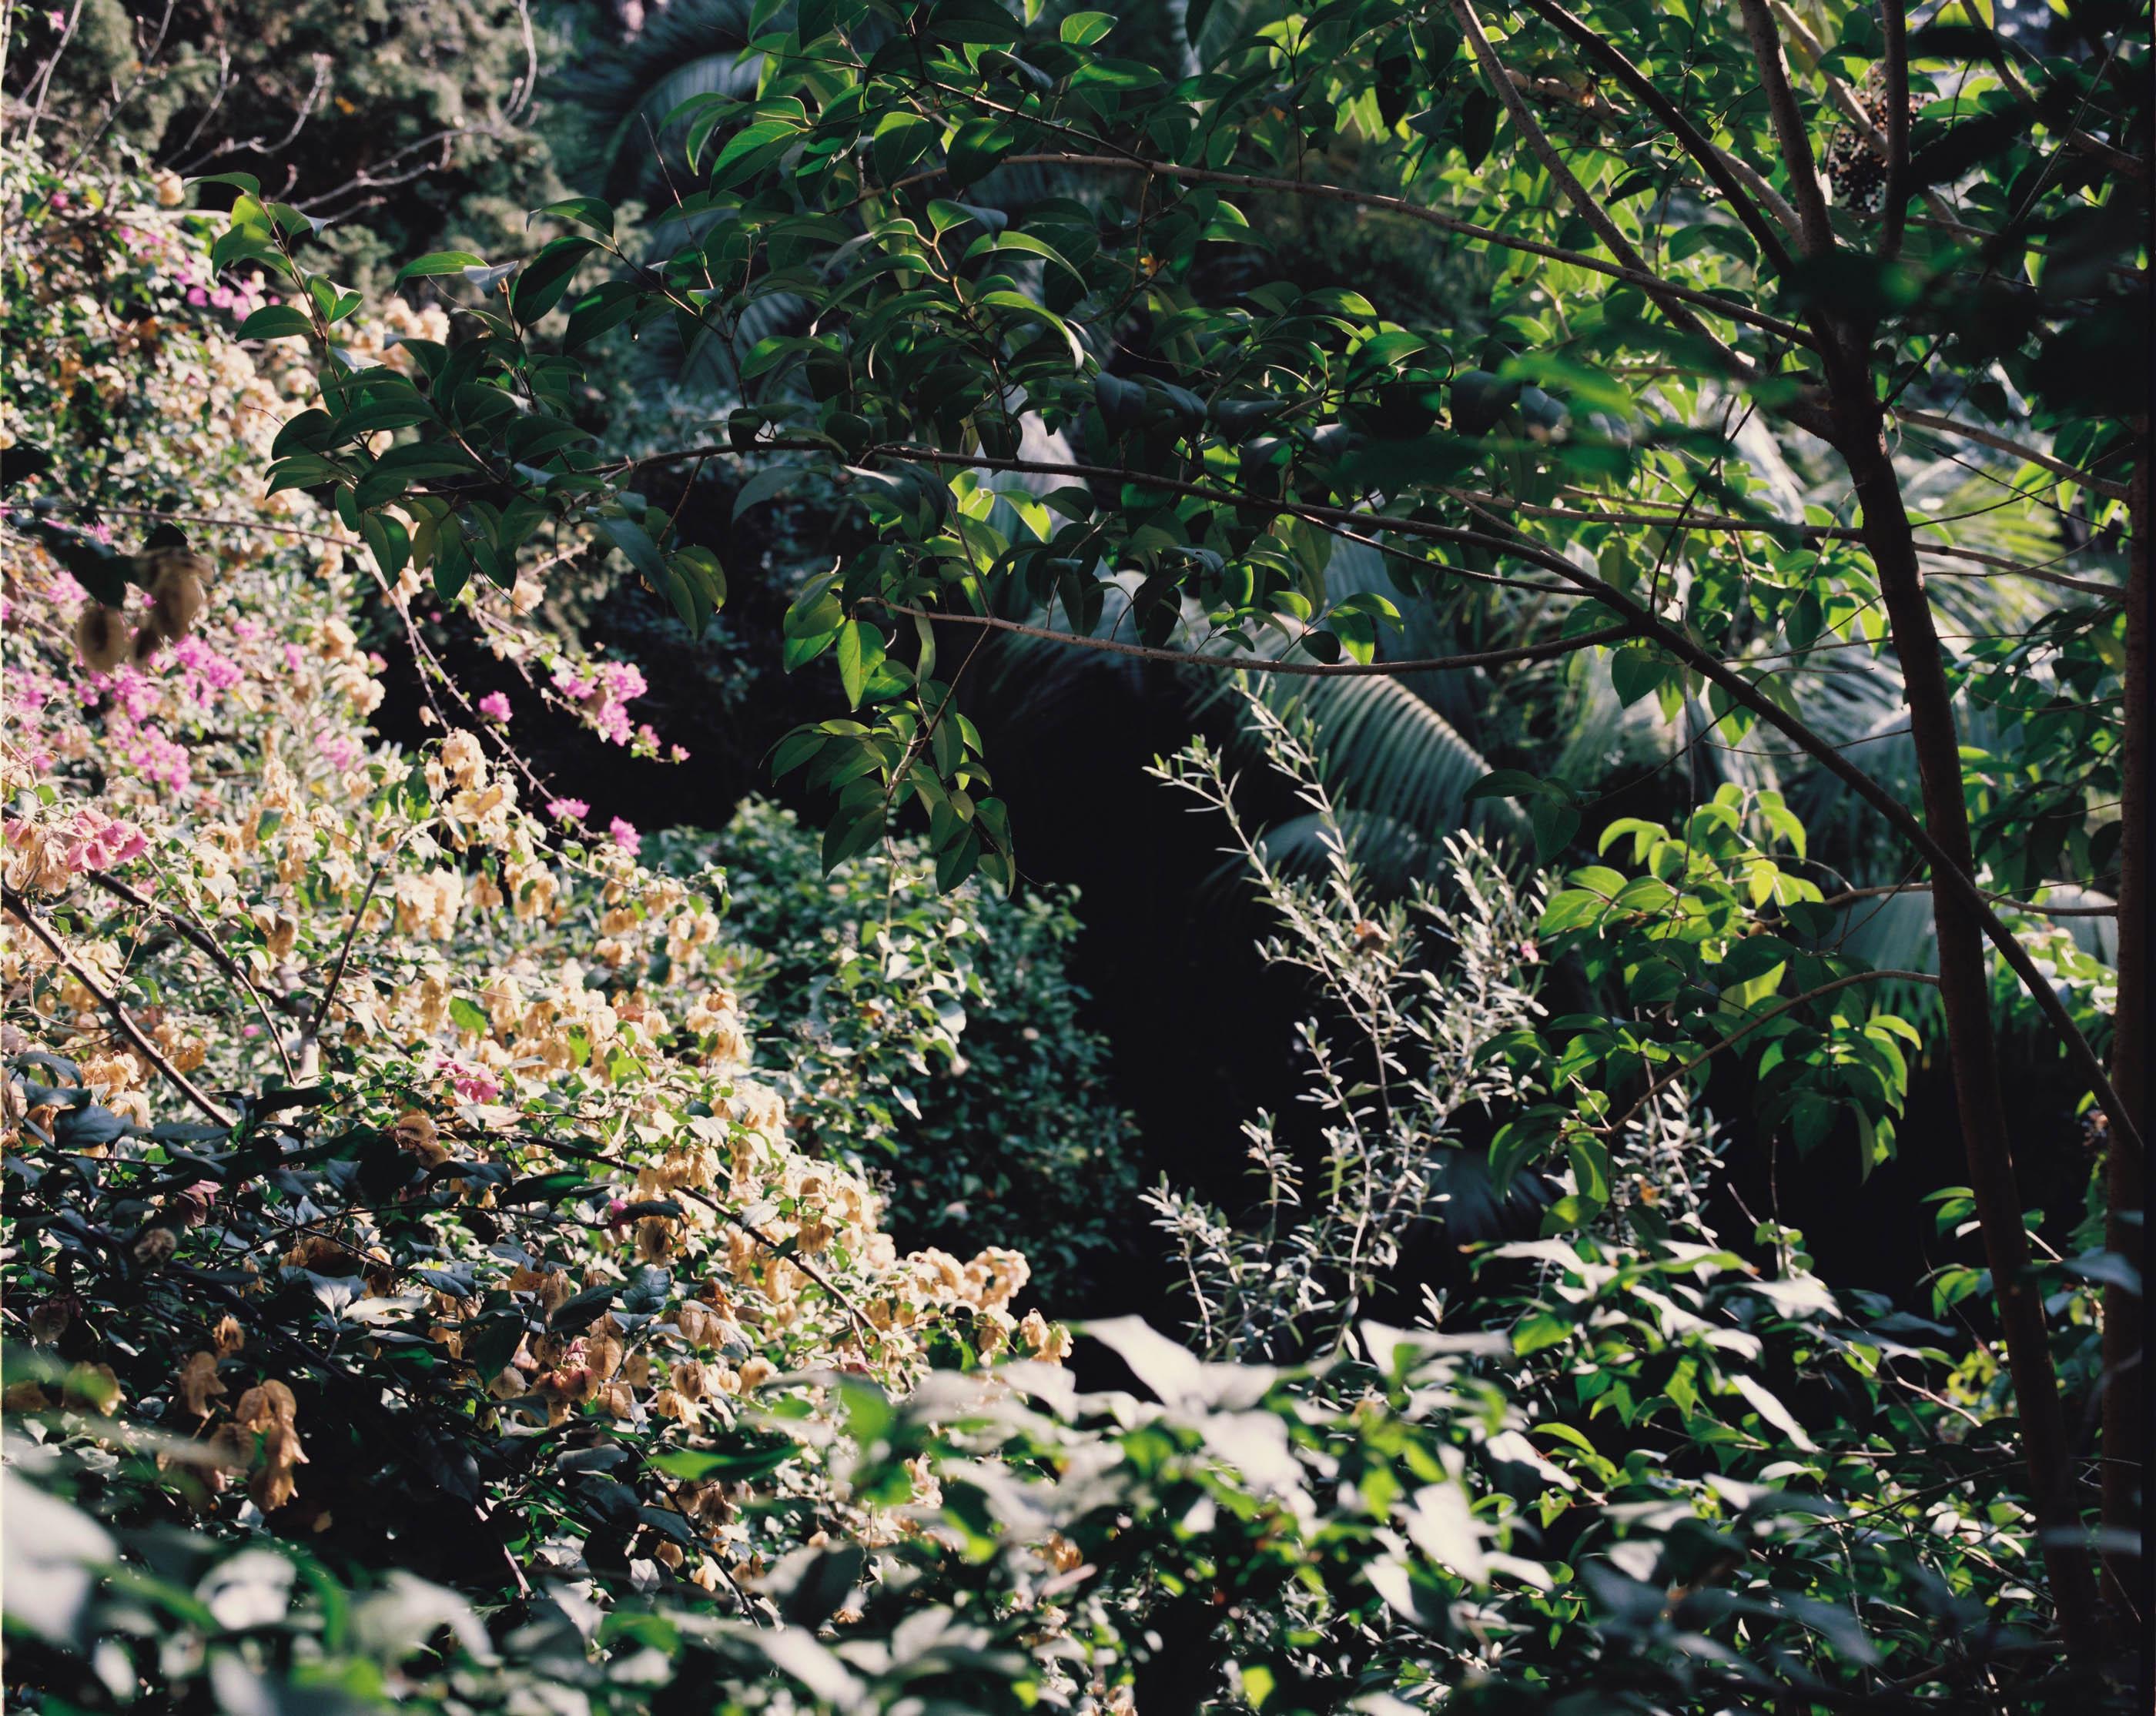 #editorial #xavier #corbero #vegetal #wallstreetjournal